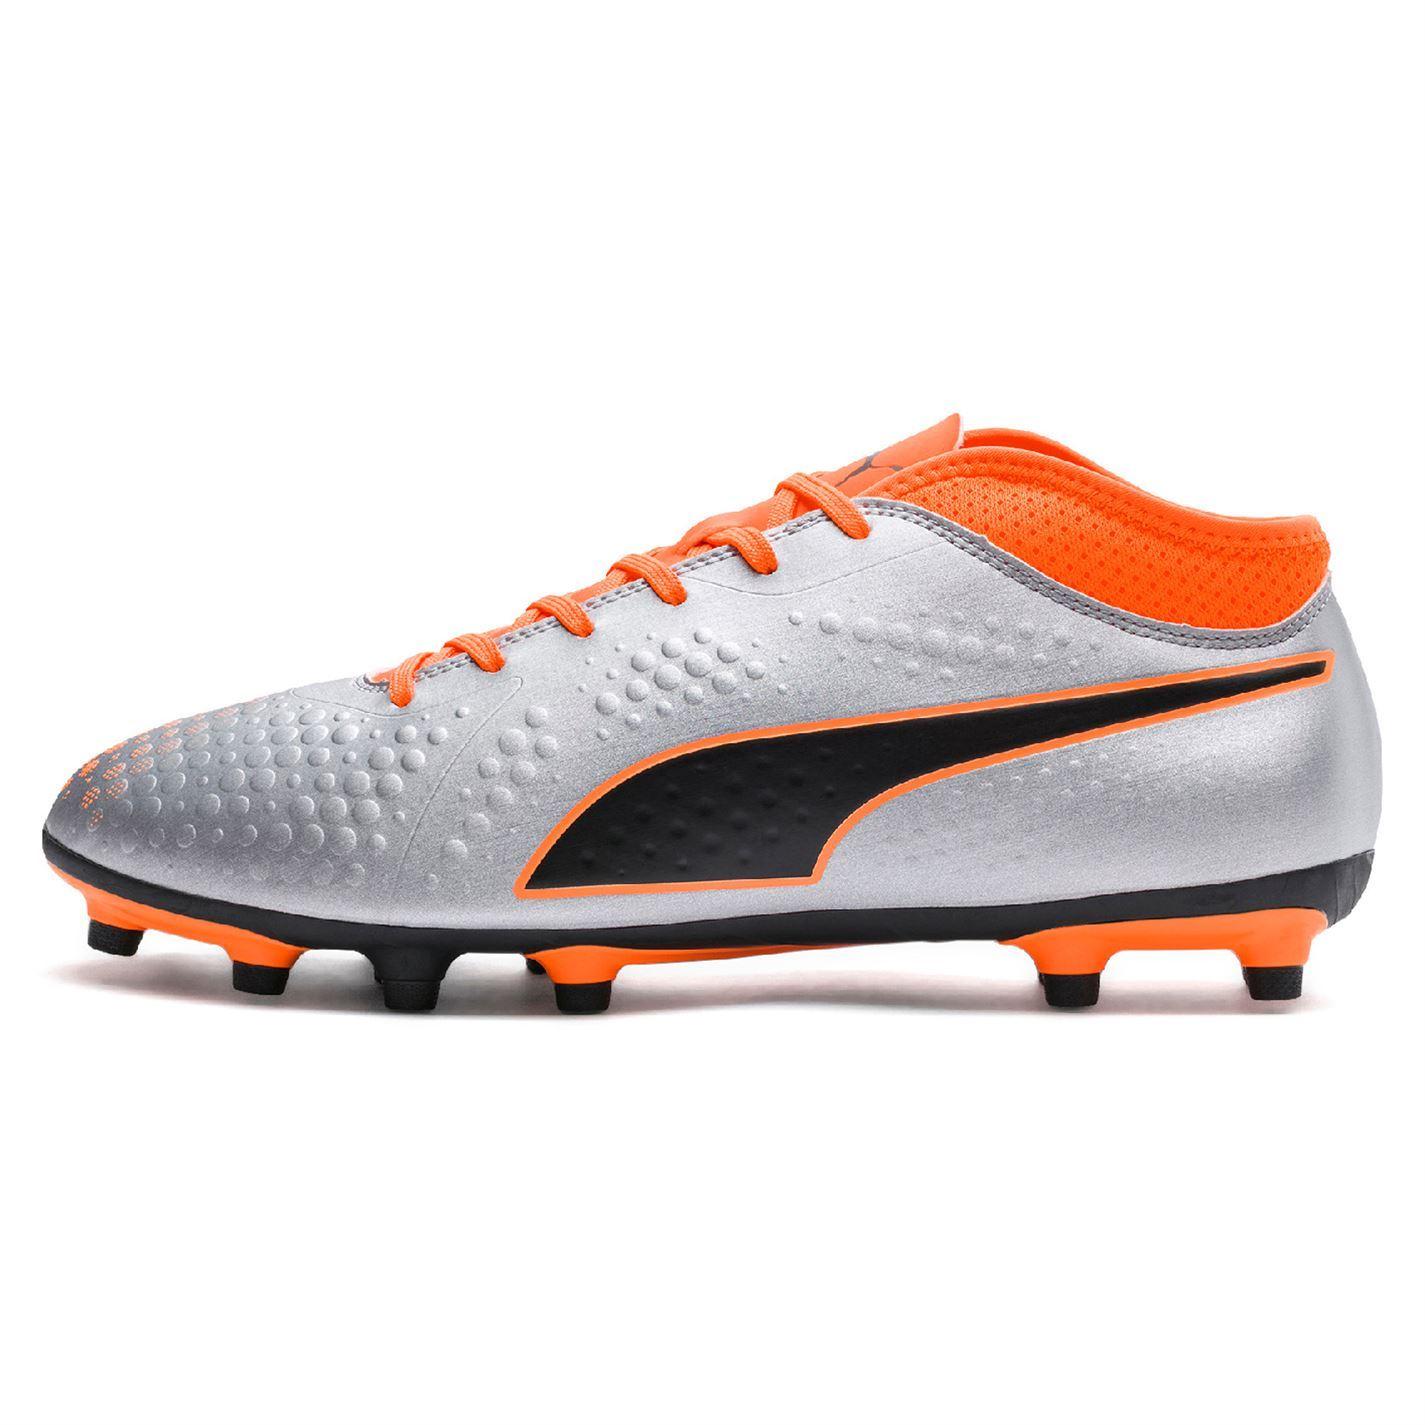 miniature 5 - Puma 4 FG Firm Ground Chaussures De Football Homme Football Chaussures Crampons